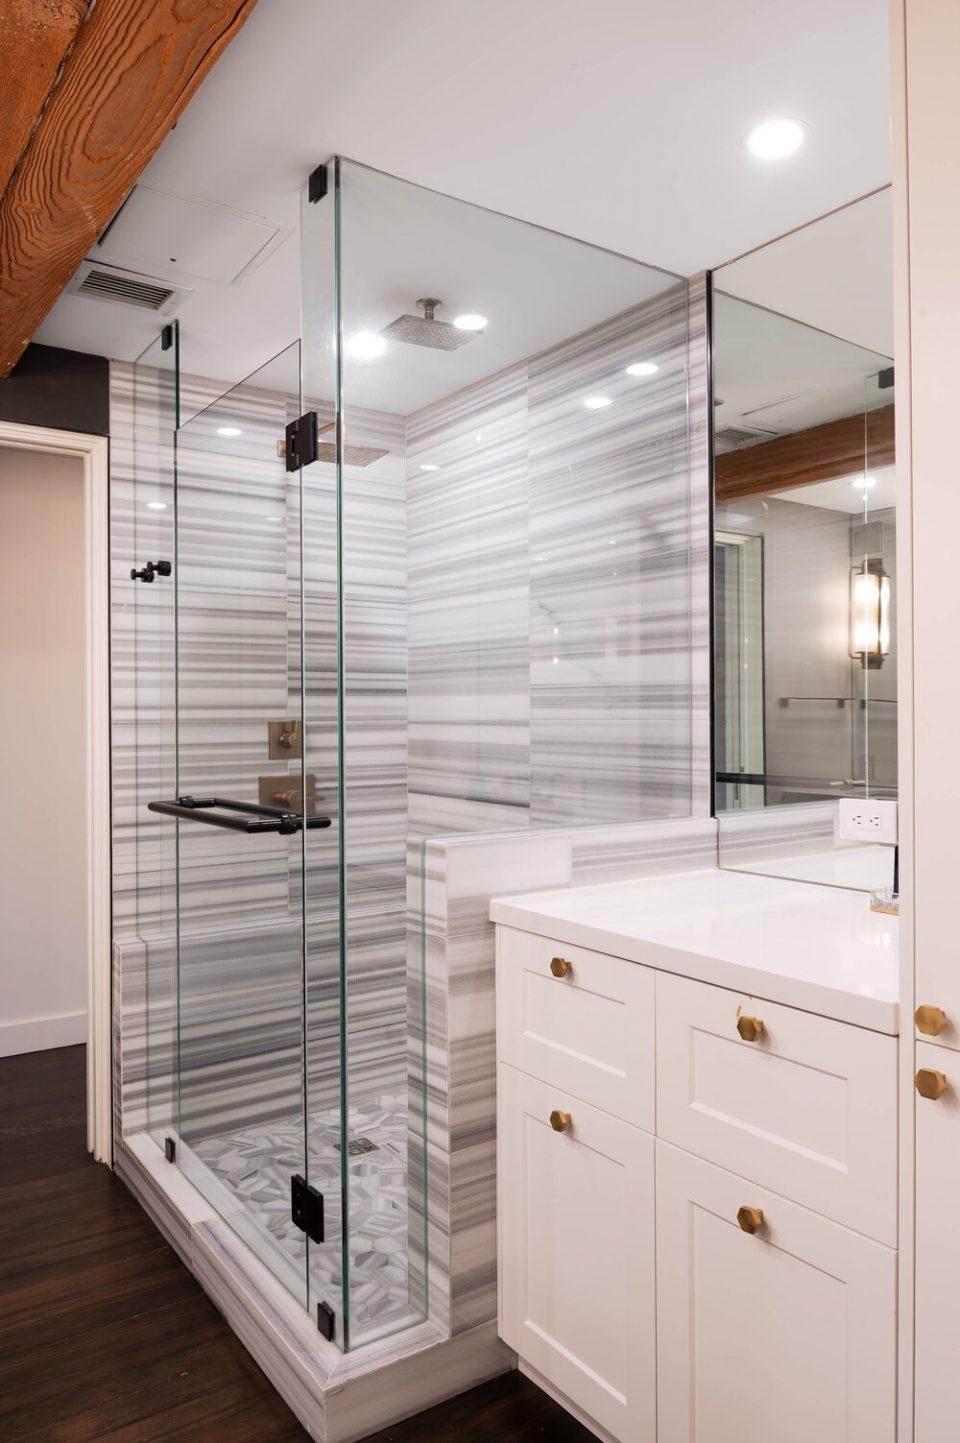 Bowman Lofts bathroom